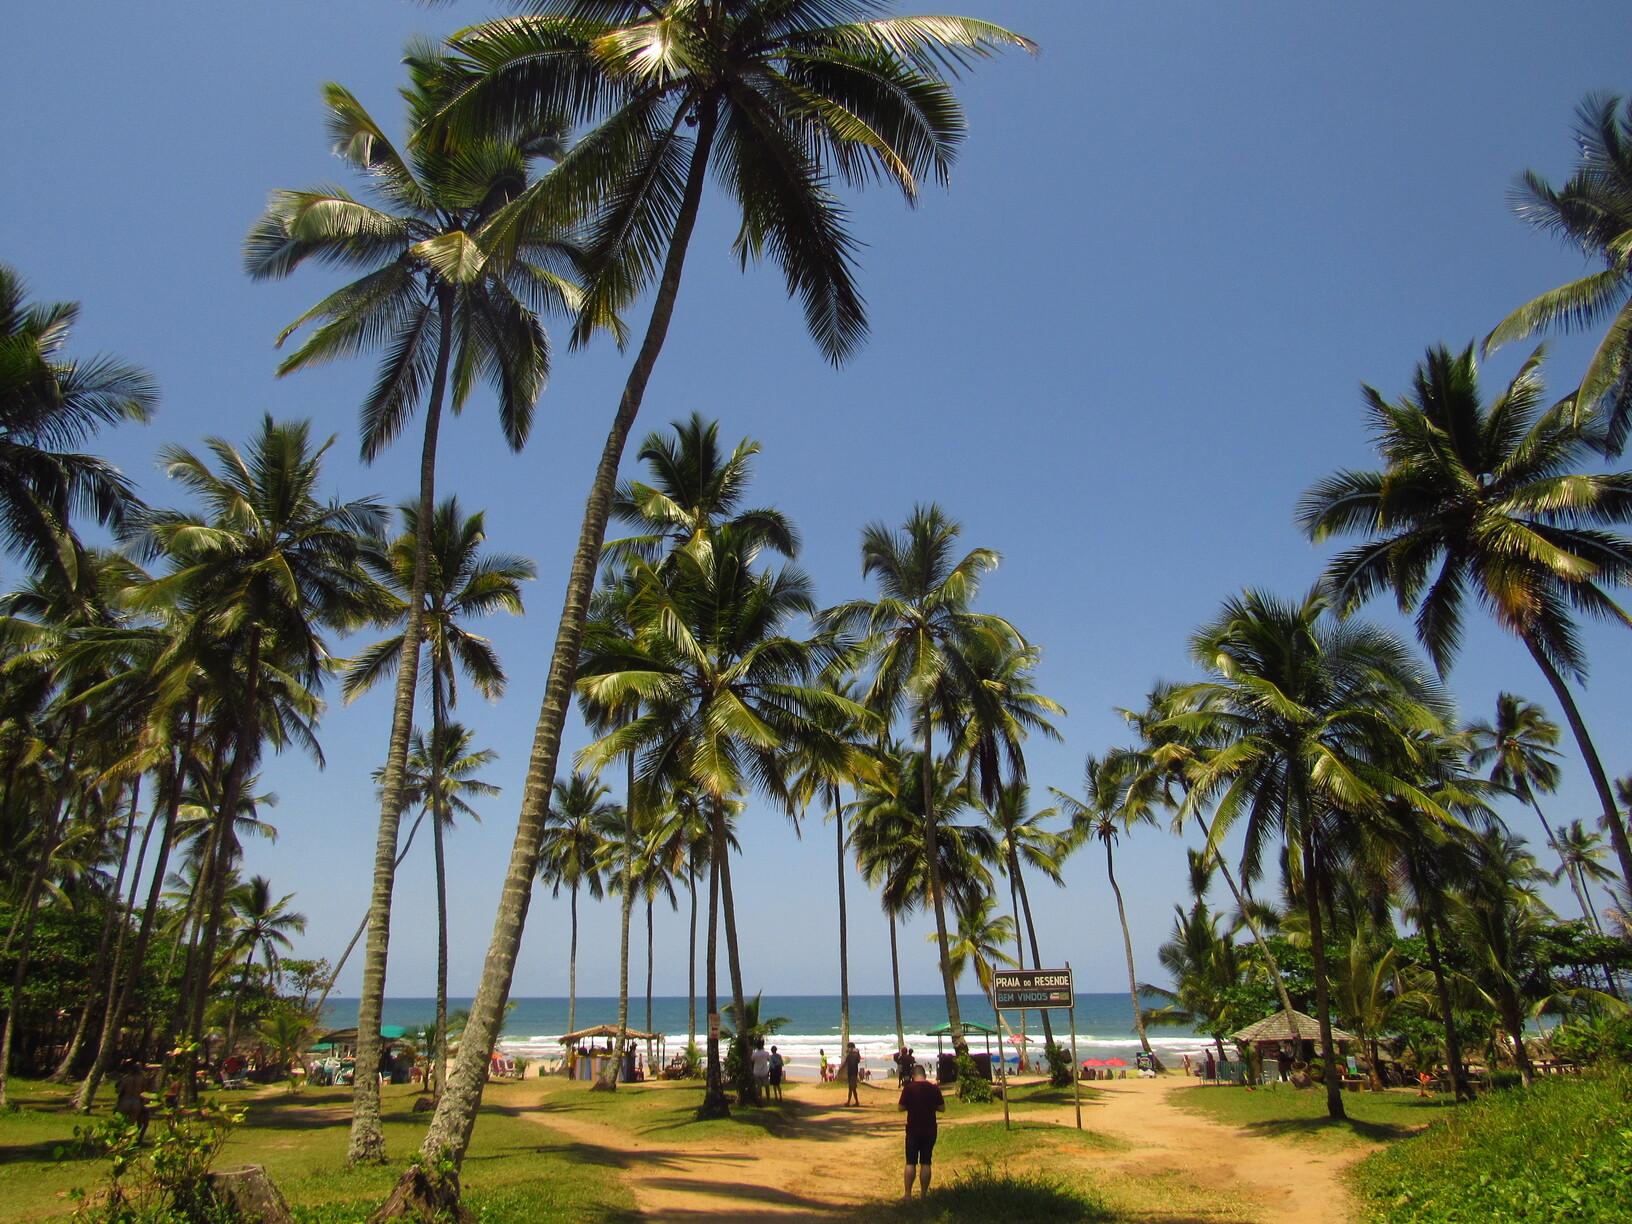 praia do rezende itacare bahia